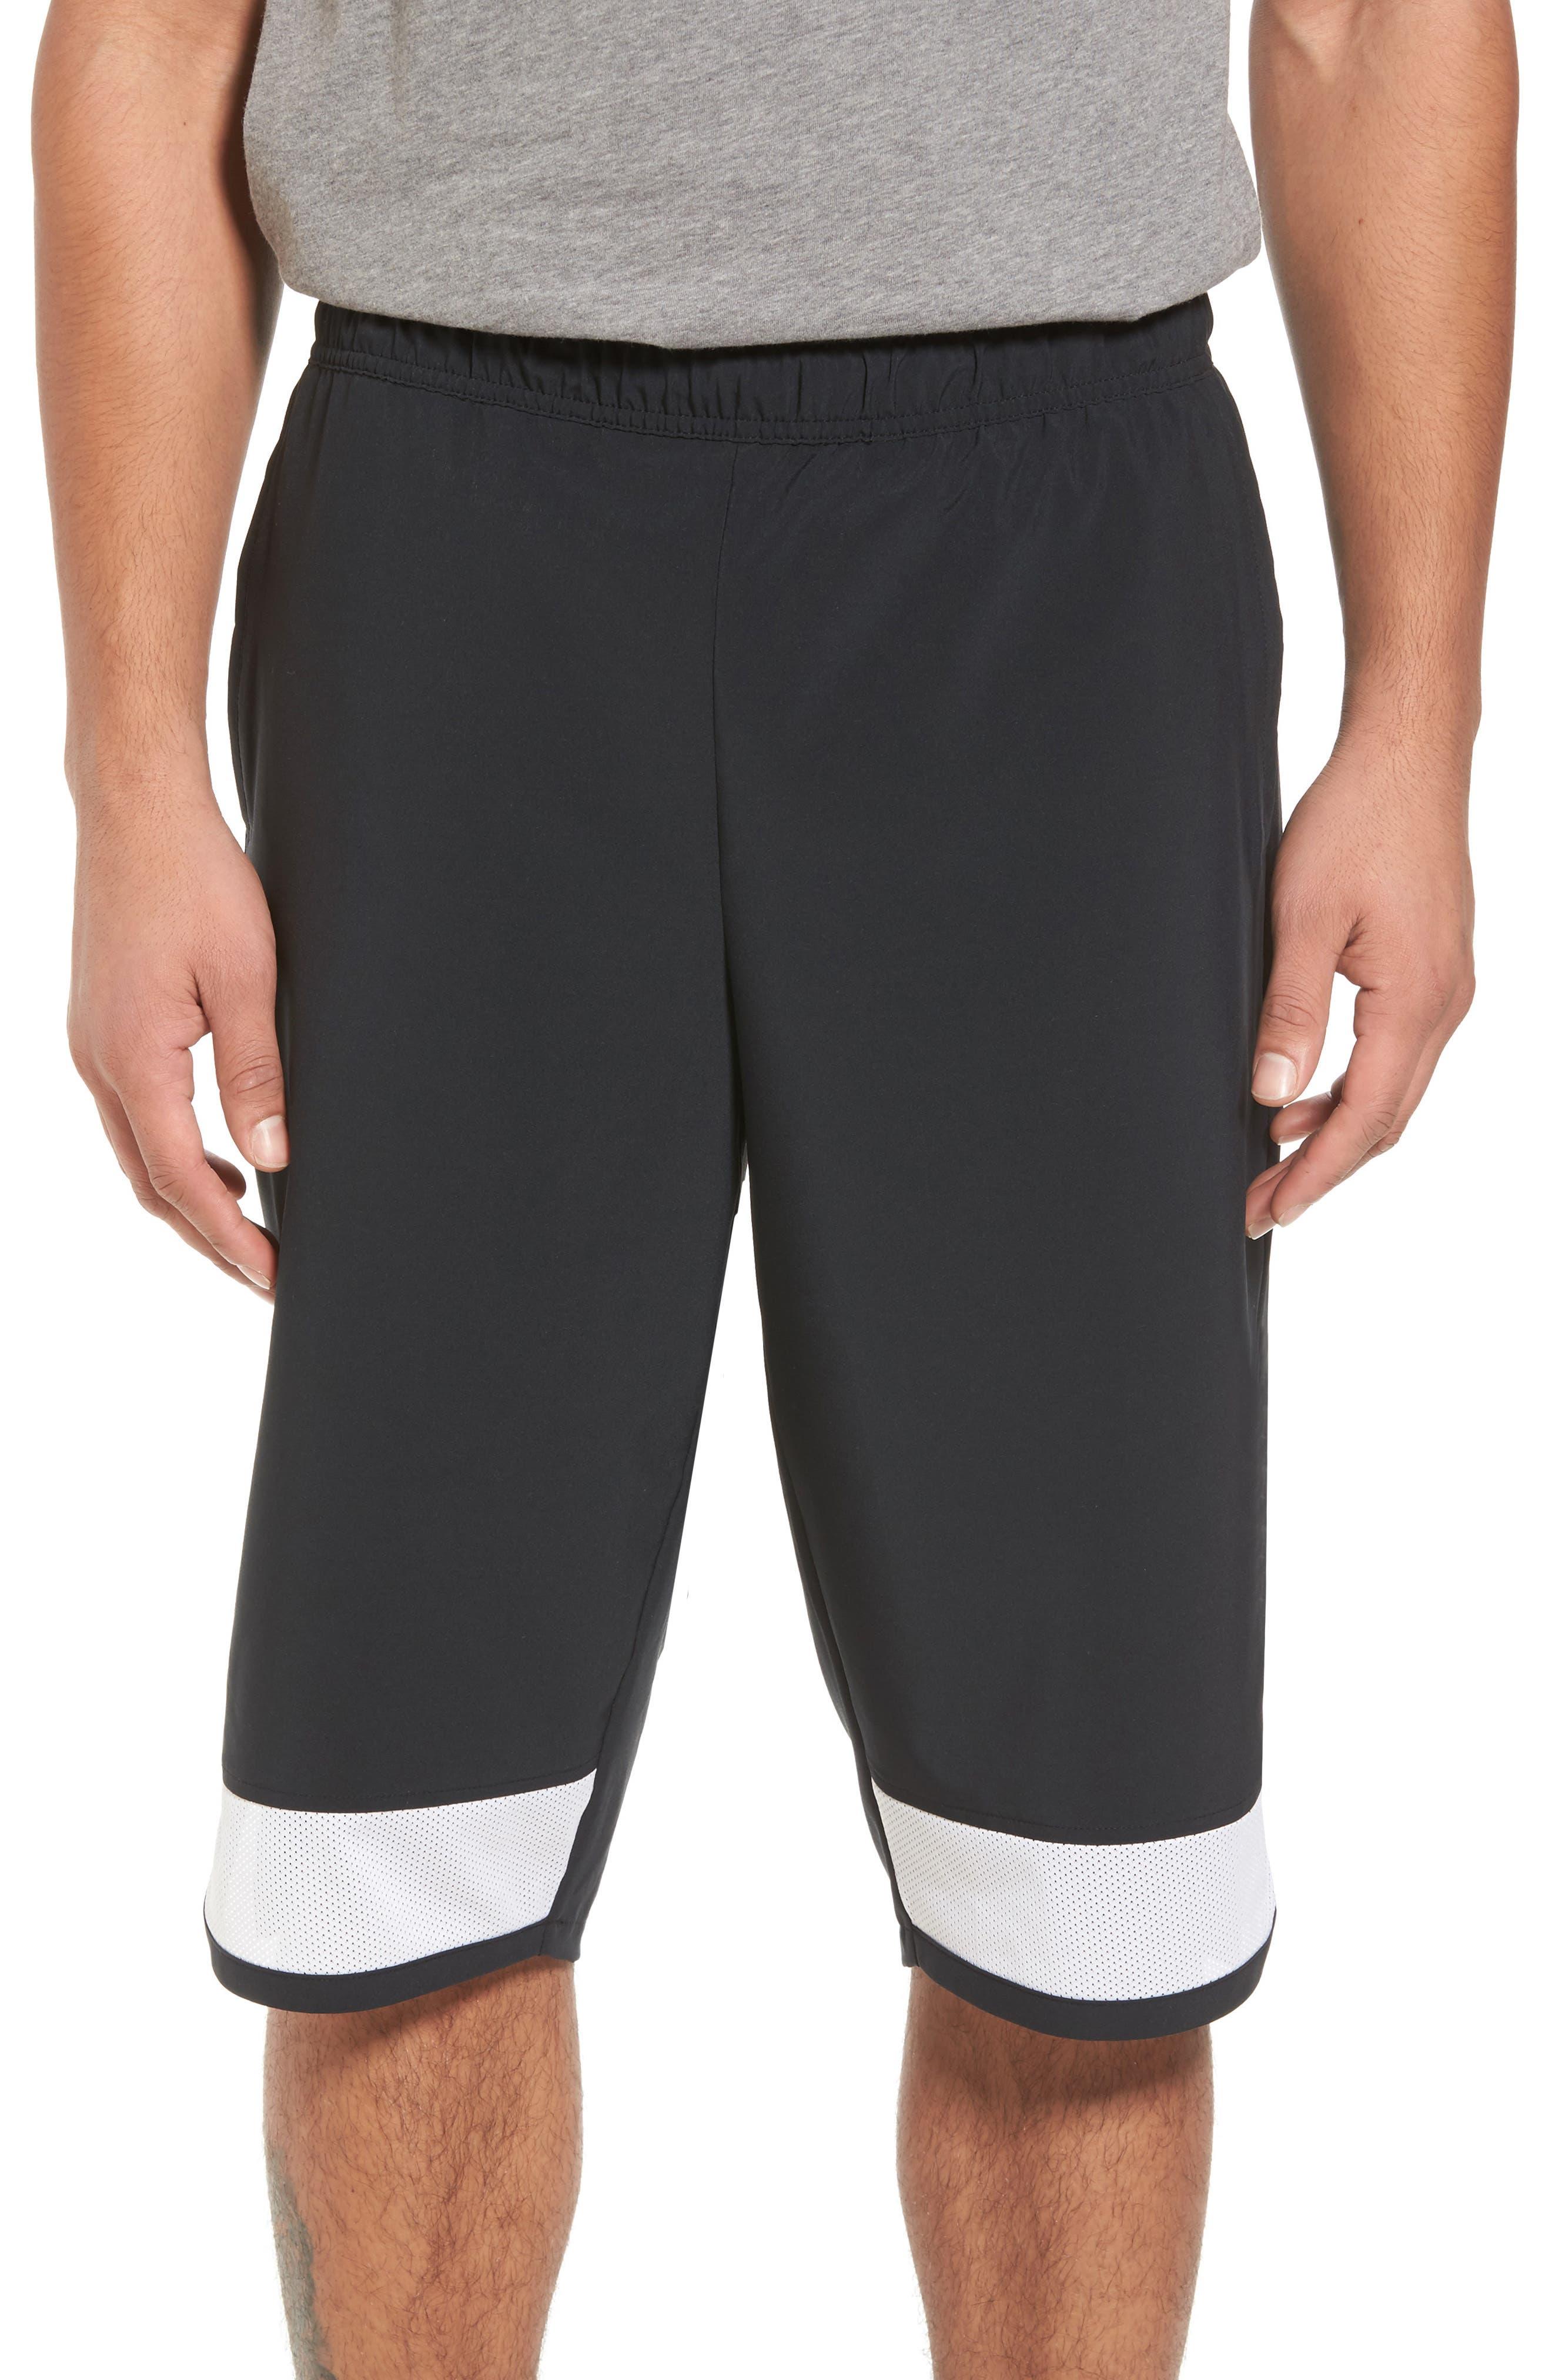 Training Flex PX Shorts,                             Main thumbnail 1, color,                             Black/ White/ White